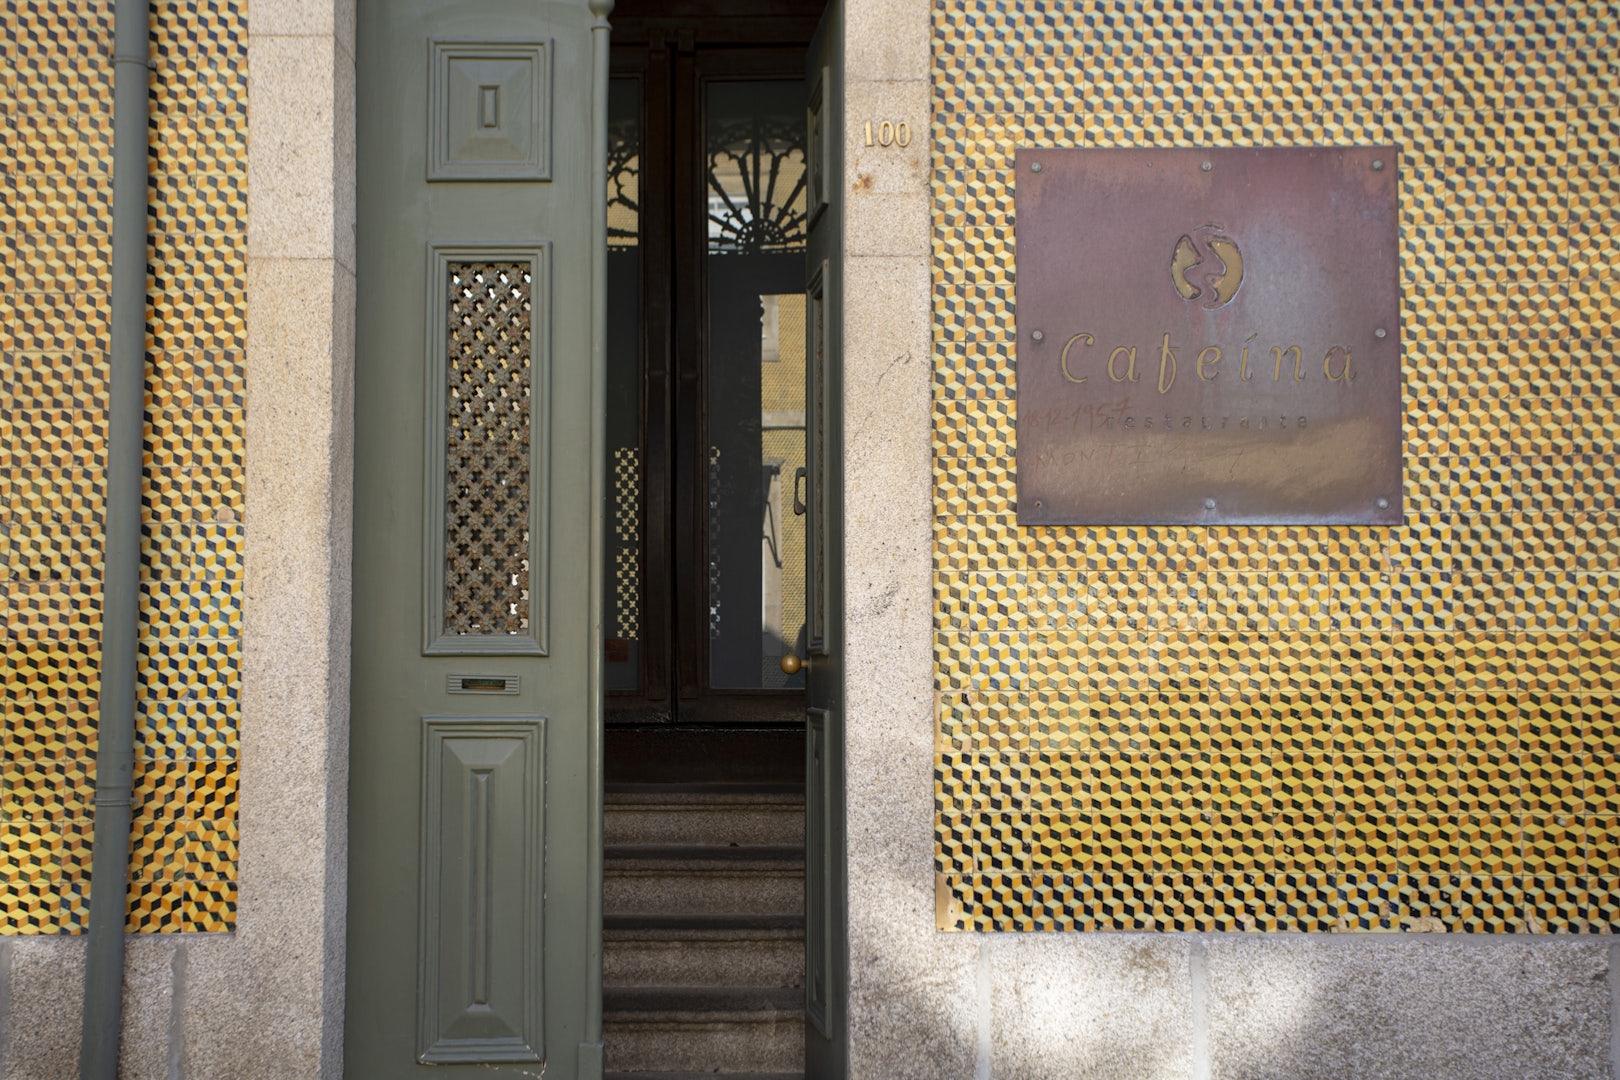 entrance to Cafeina restaurant in Porto